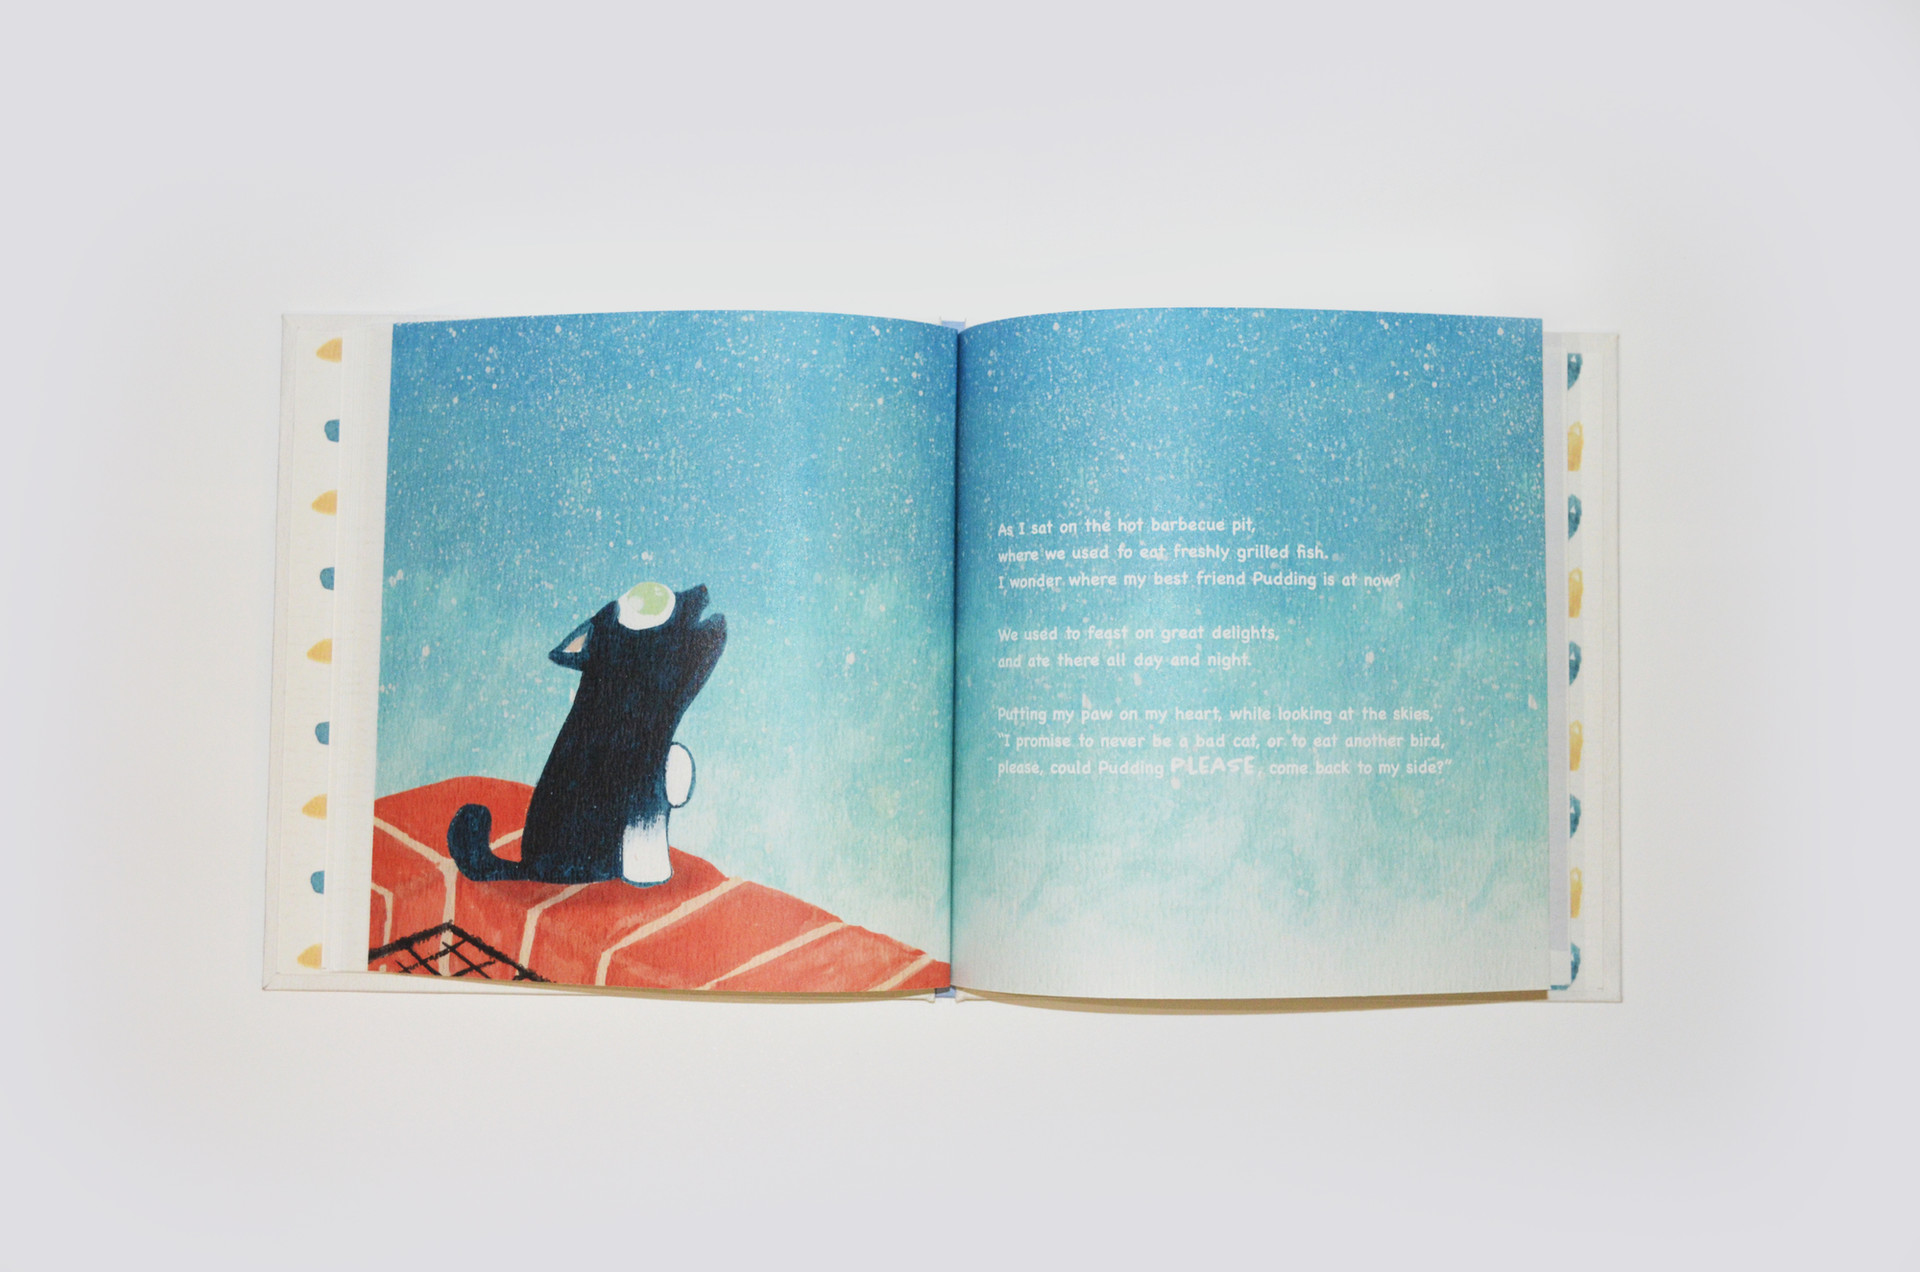 Book 2: My Best Friend, Pudding